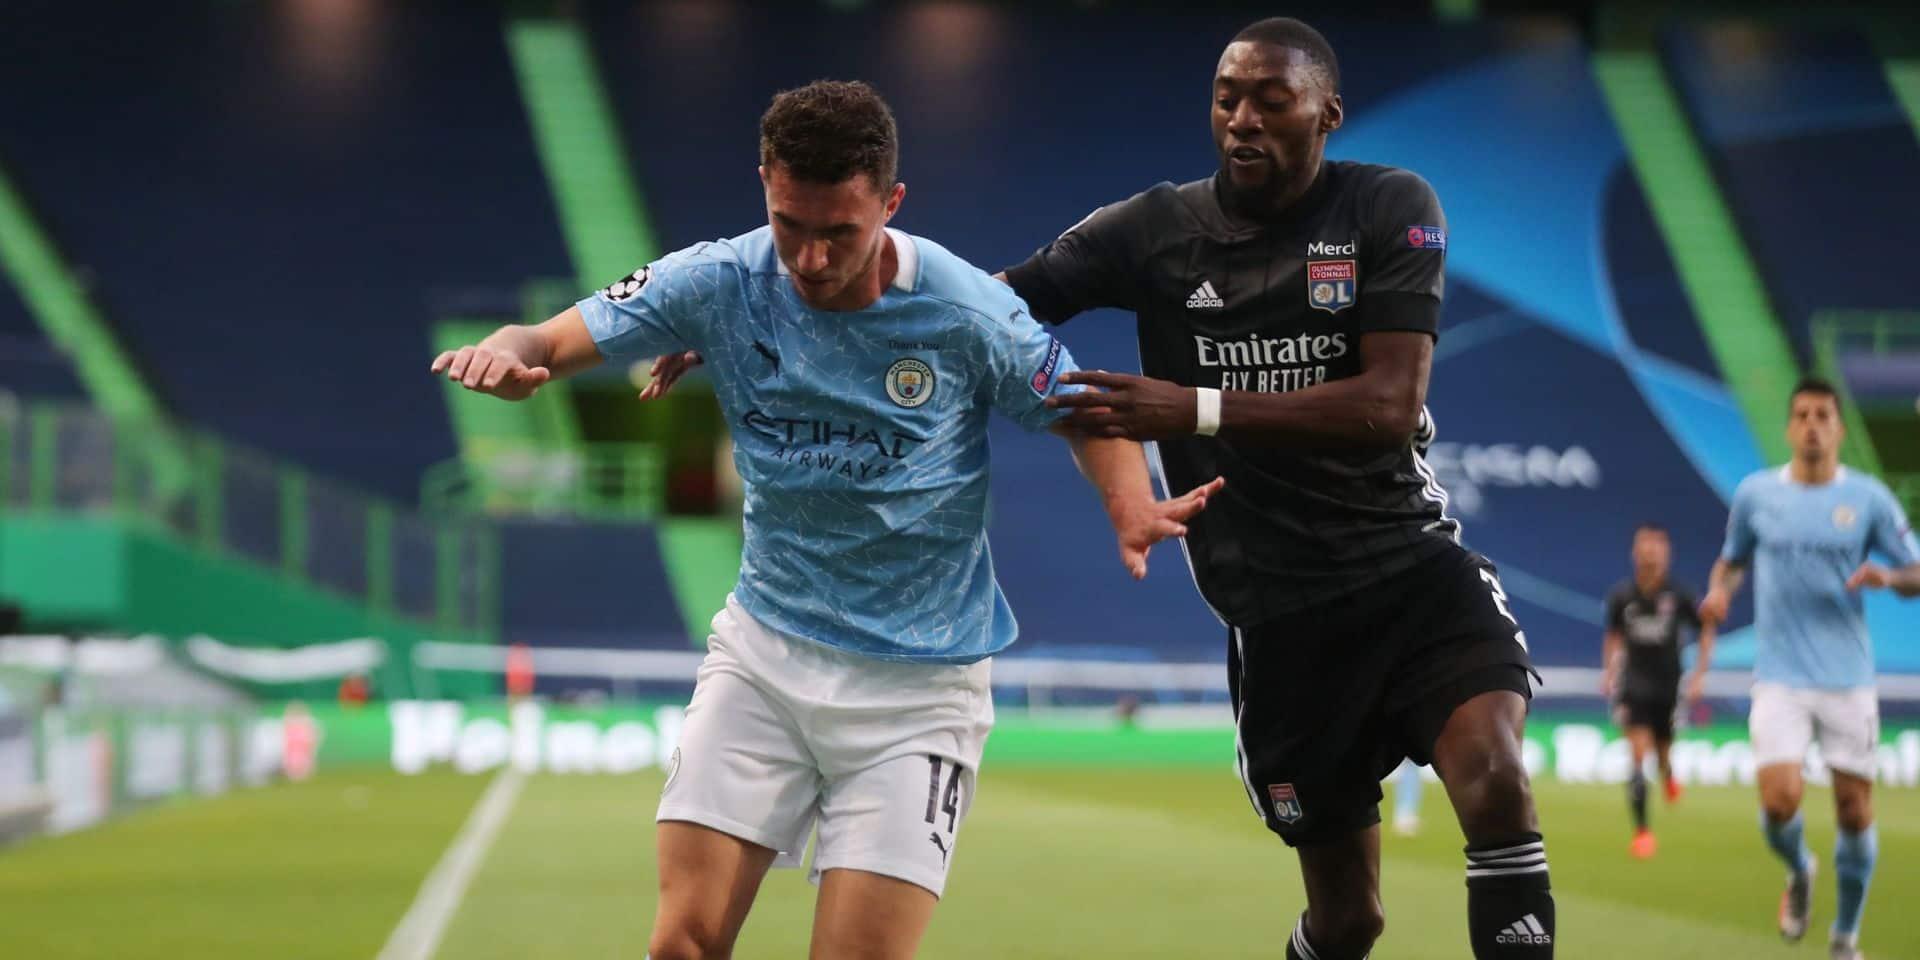 Manchester City: Aymeric Laporte et Riyad Mahrez testés positifs au Covid-19